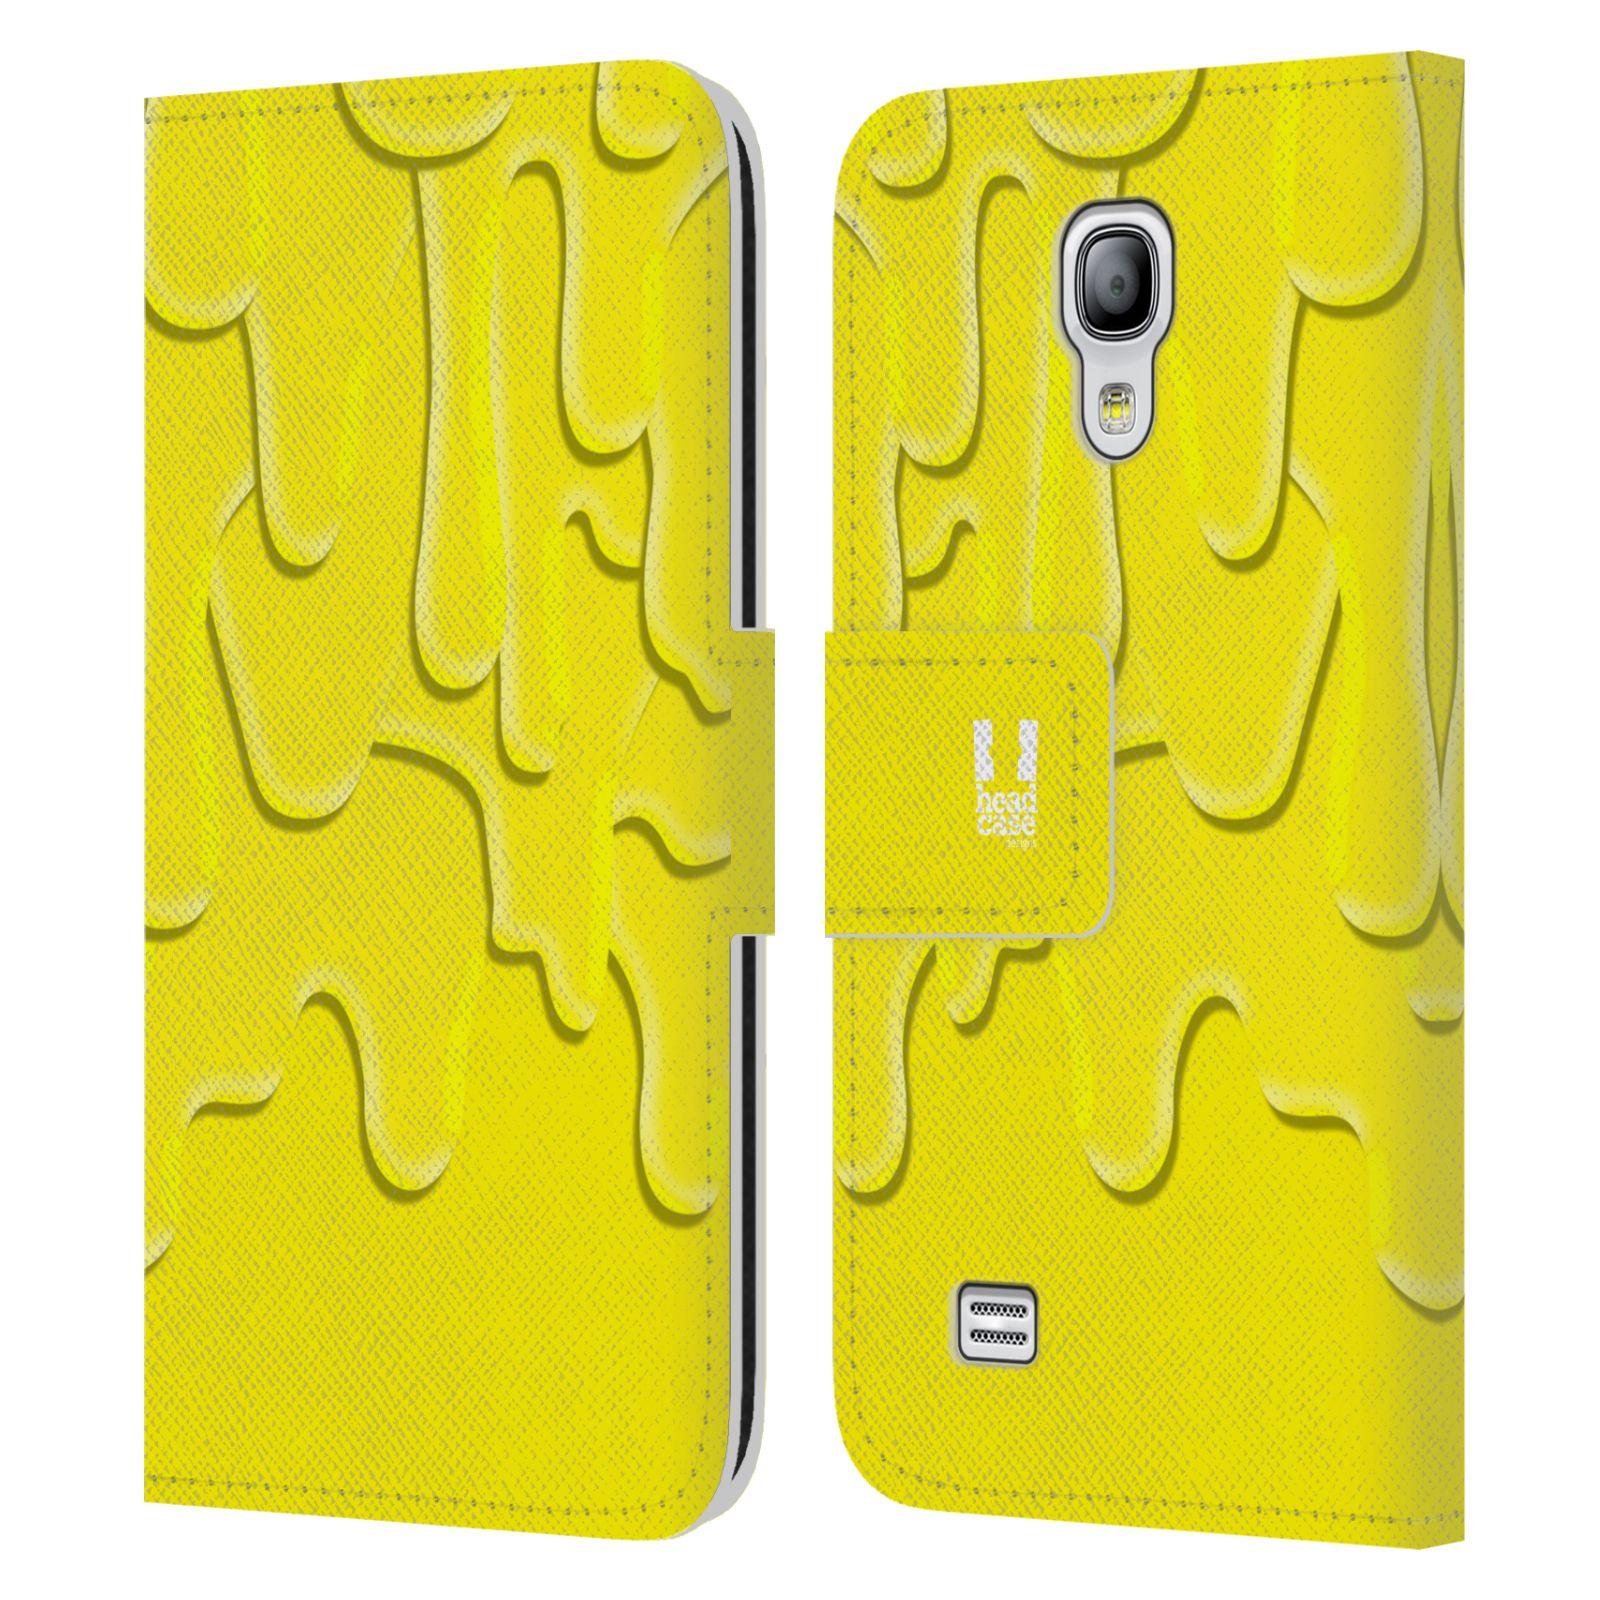 HEAD CASE Flipové pouzdro pro mobil Samsung Galaxy S4 MINI / S4 MINI DUOS ZÁPLAVA BARVA žlutá